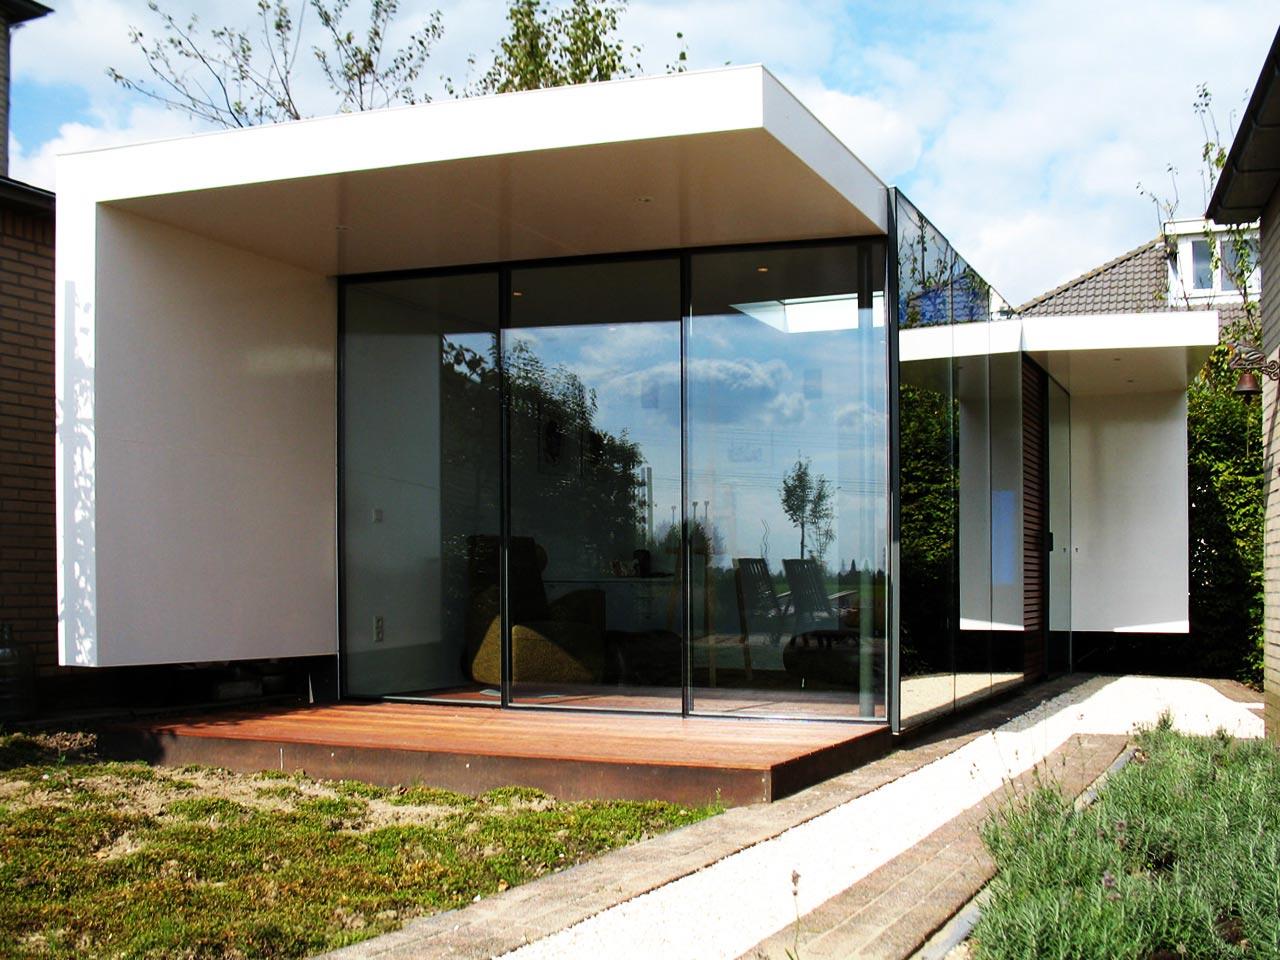 Art studio-exterior view